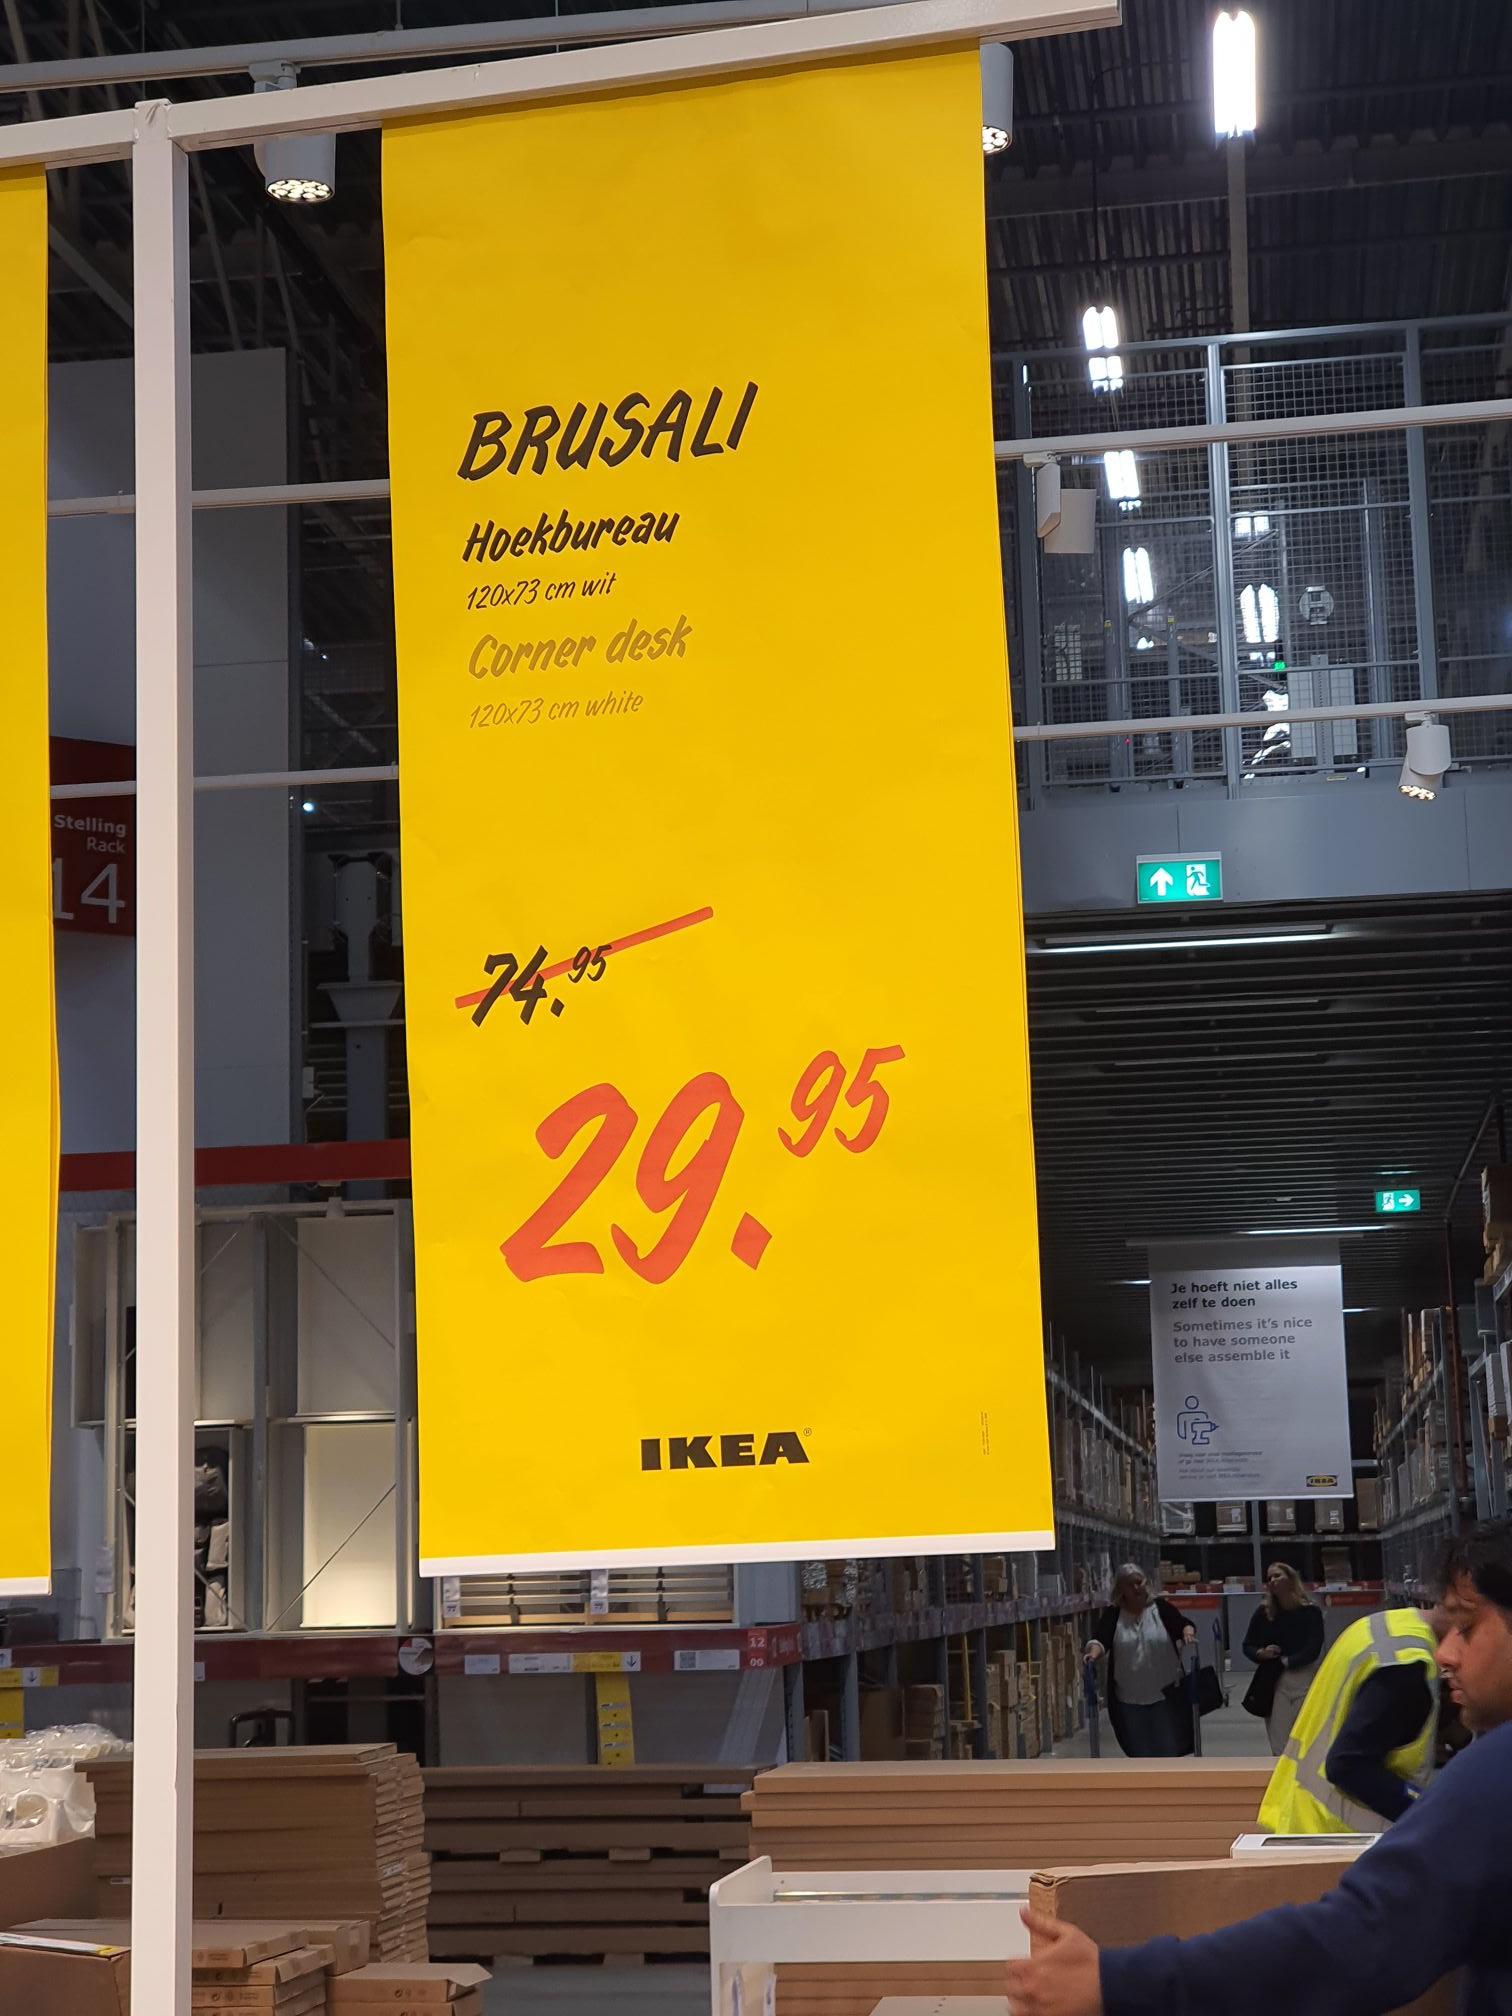 IKEA brusali hoek bureau 29,95